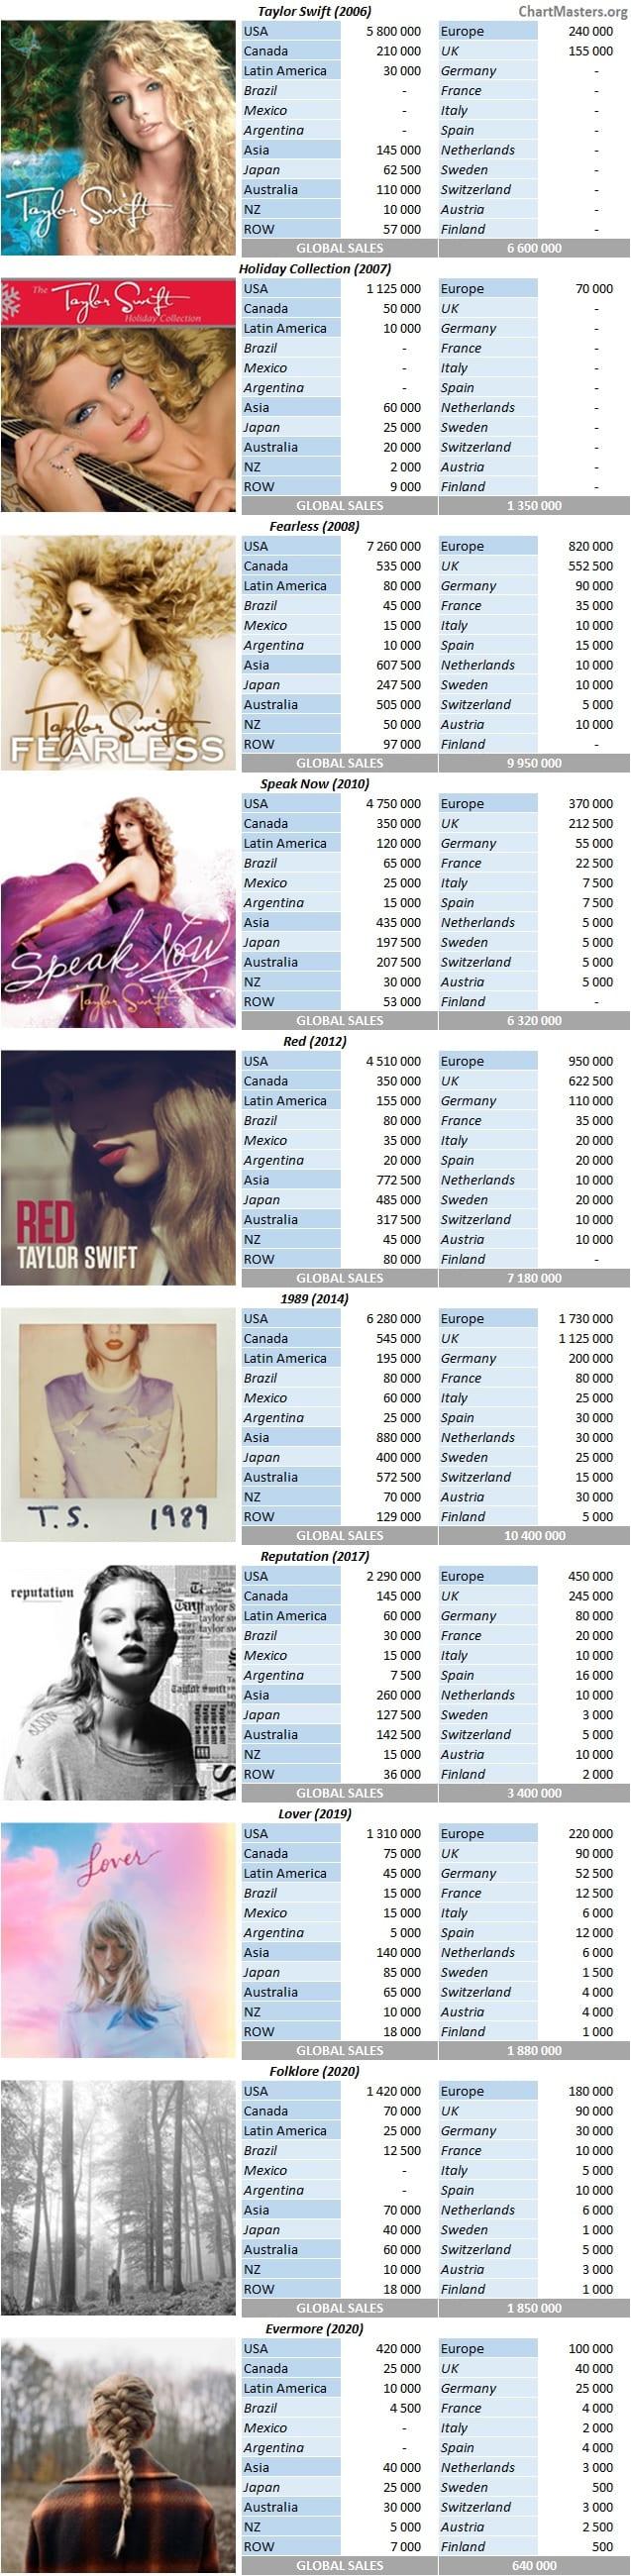 Taylor Swift Studio Album Sales 202105